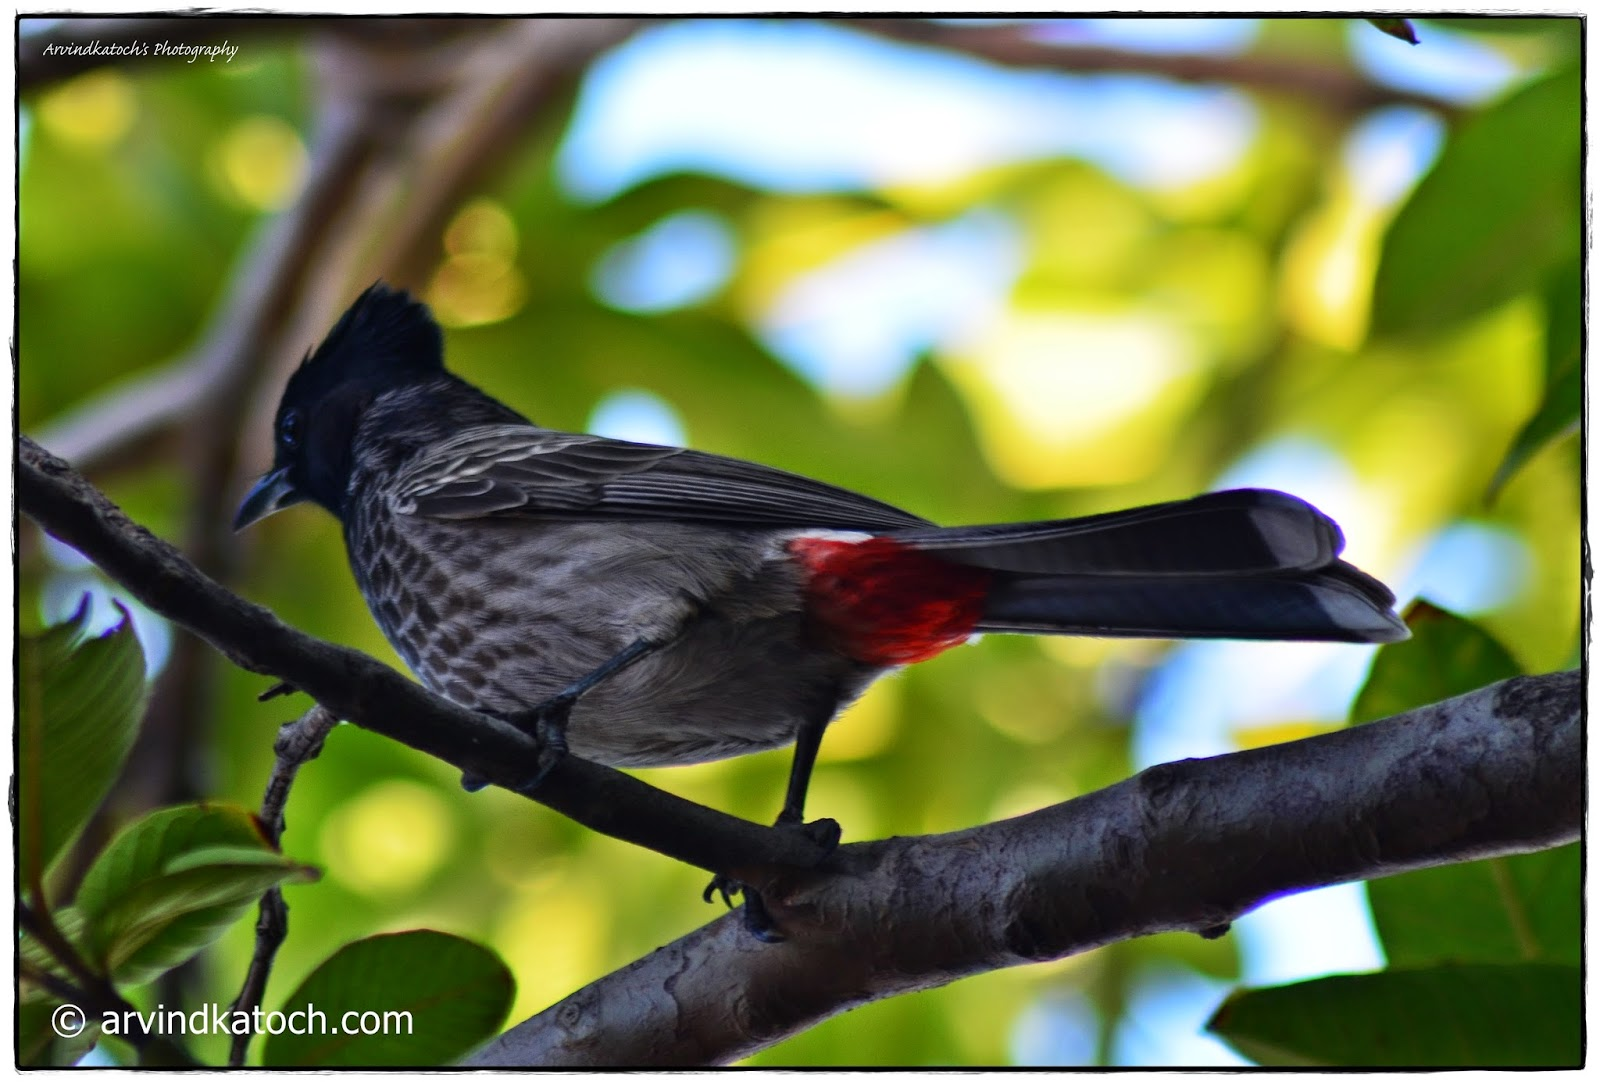 Bulbul, Red-vented Bulbul, Pycnonotus cafer, Birds,